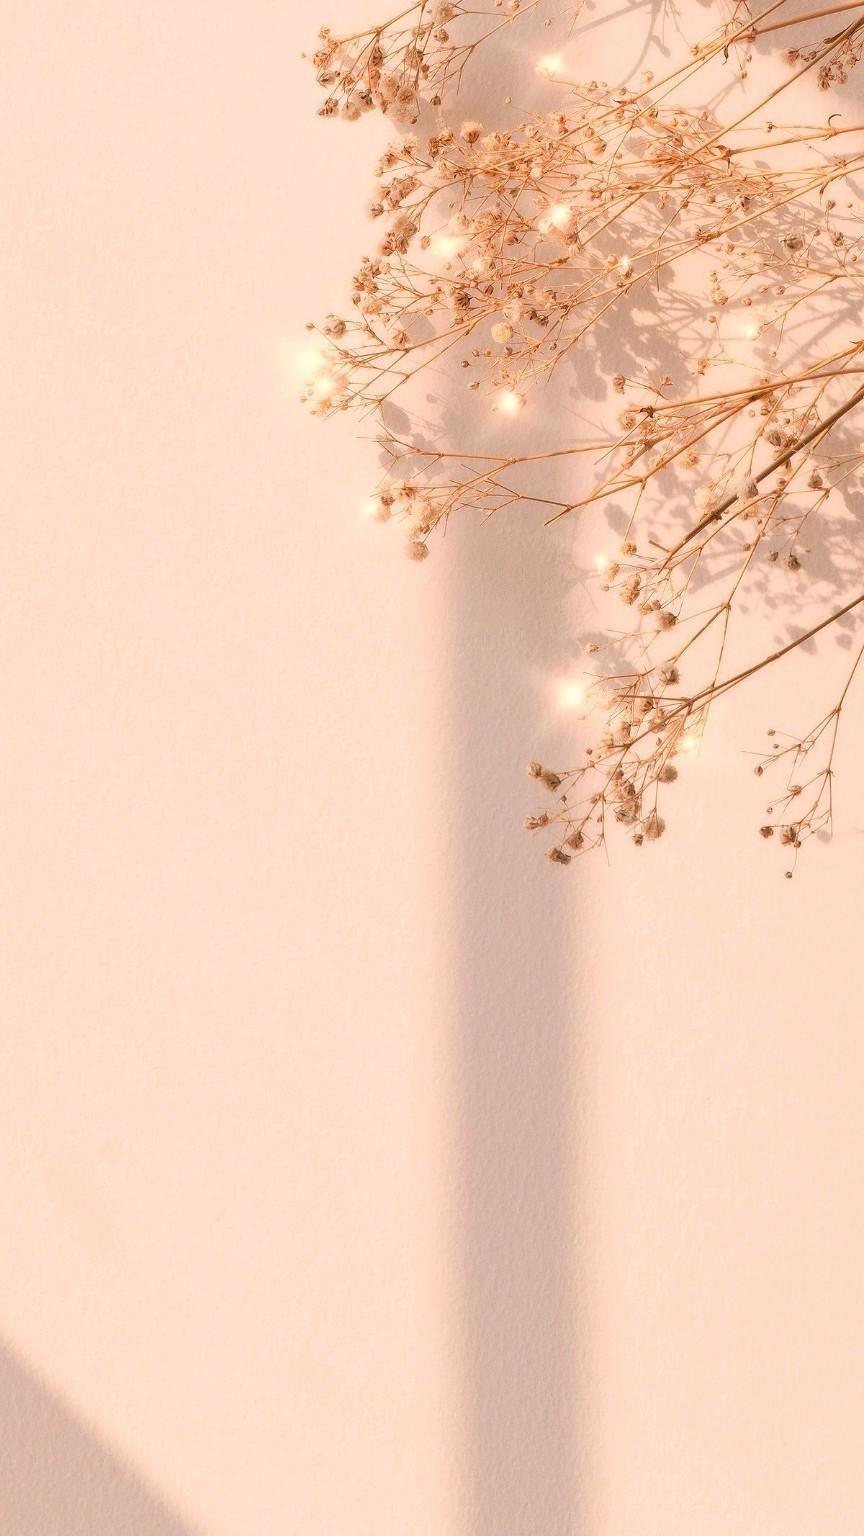 aesthetic background